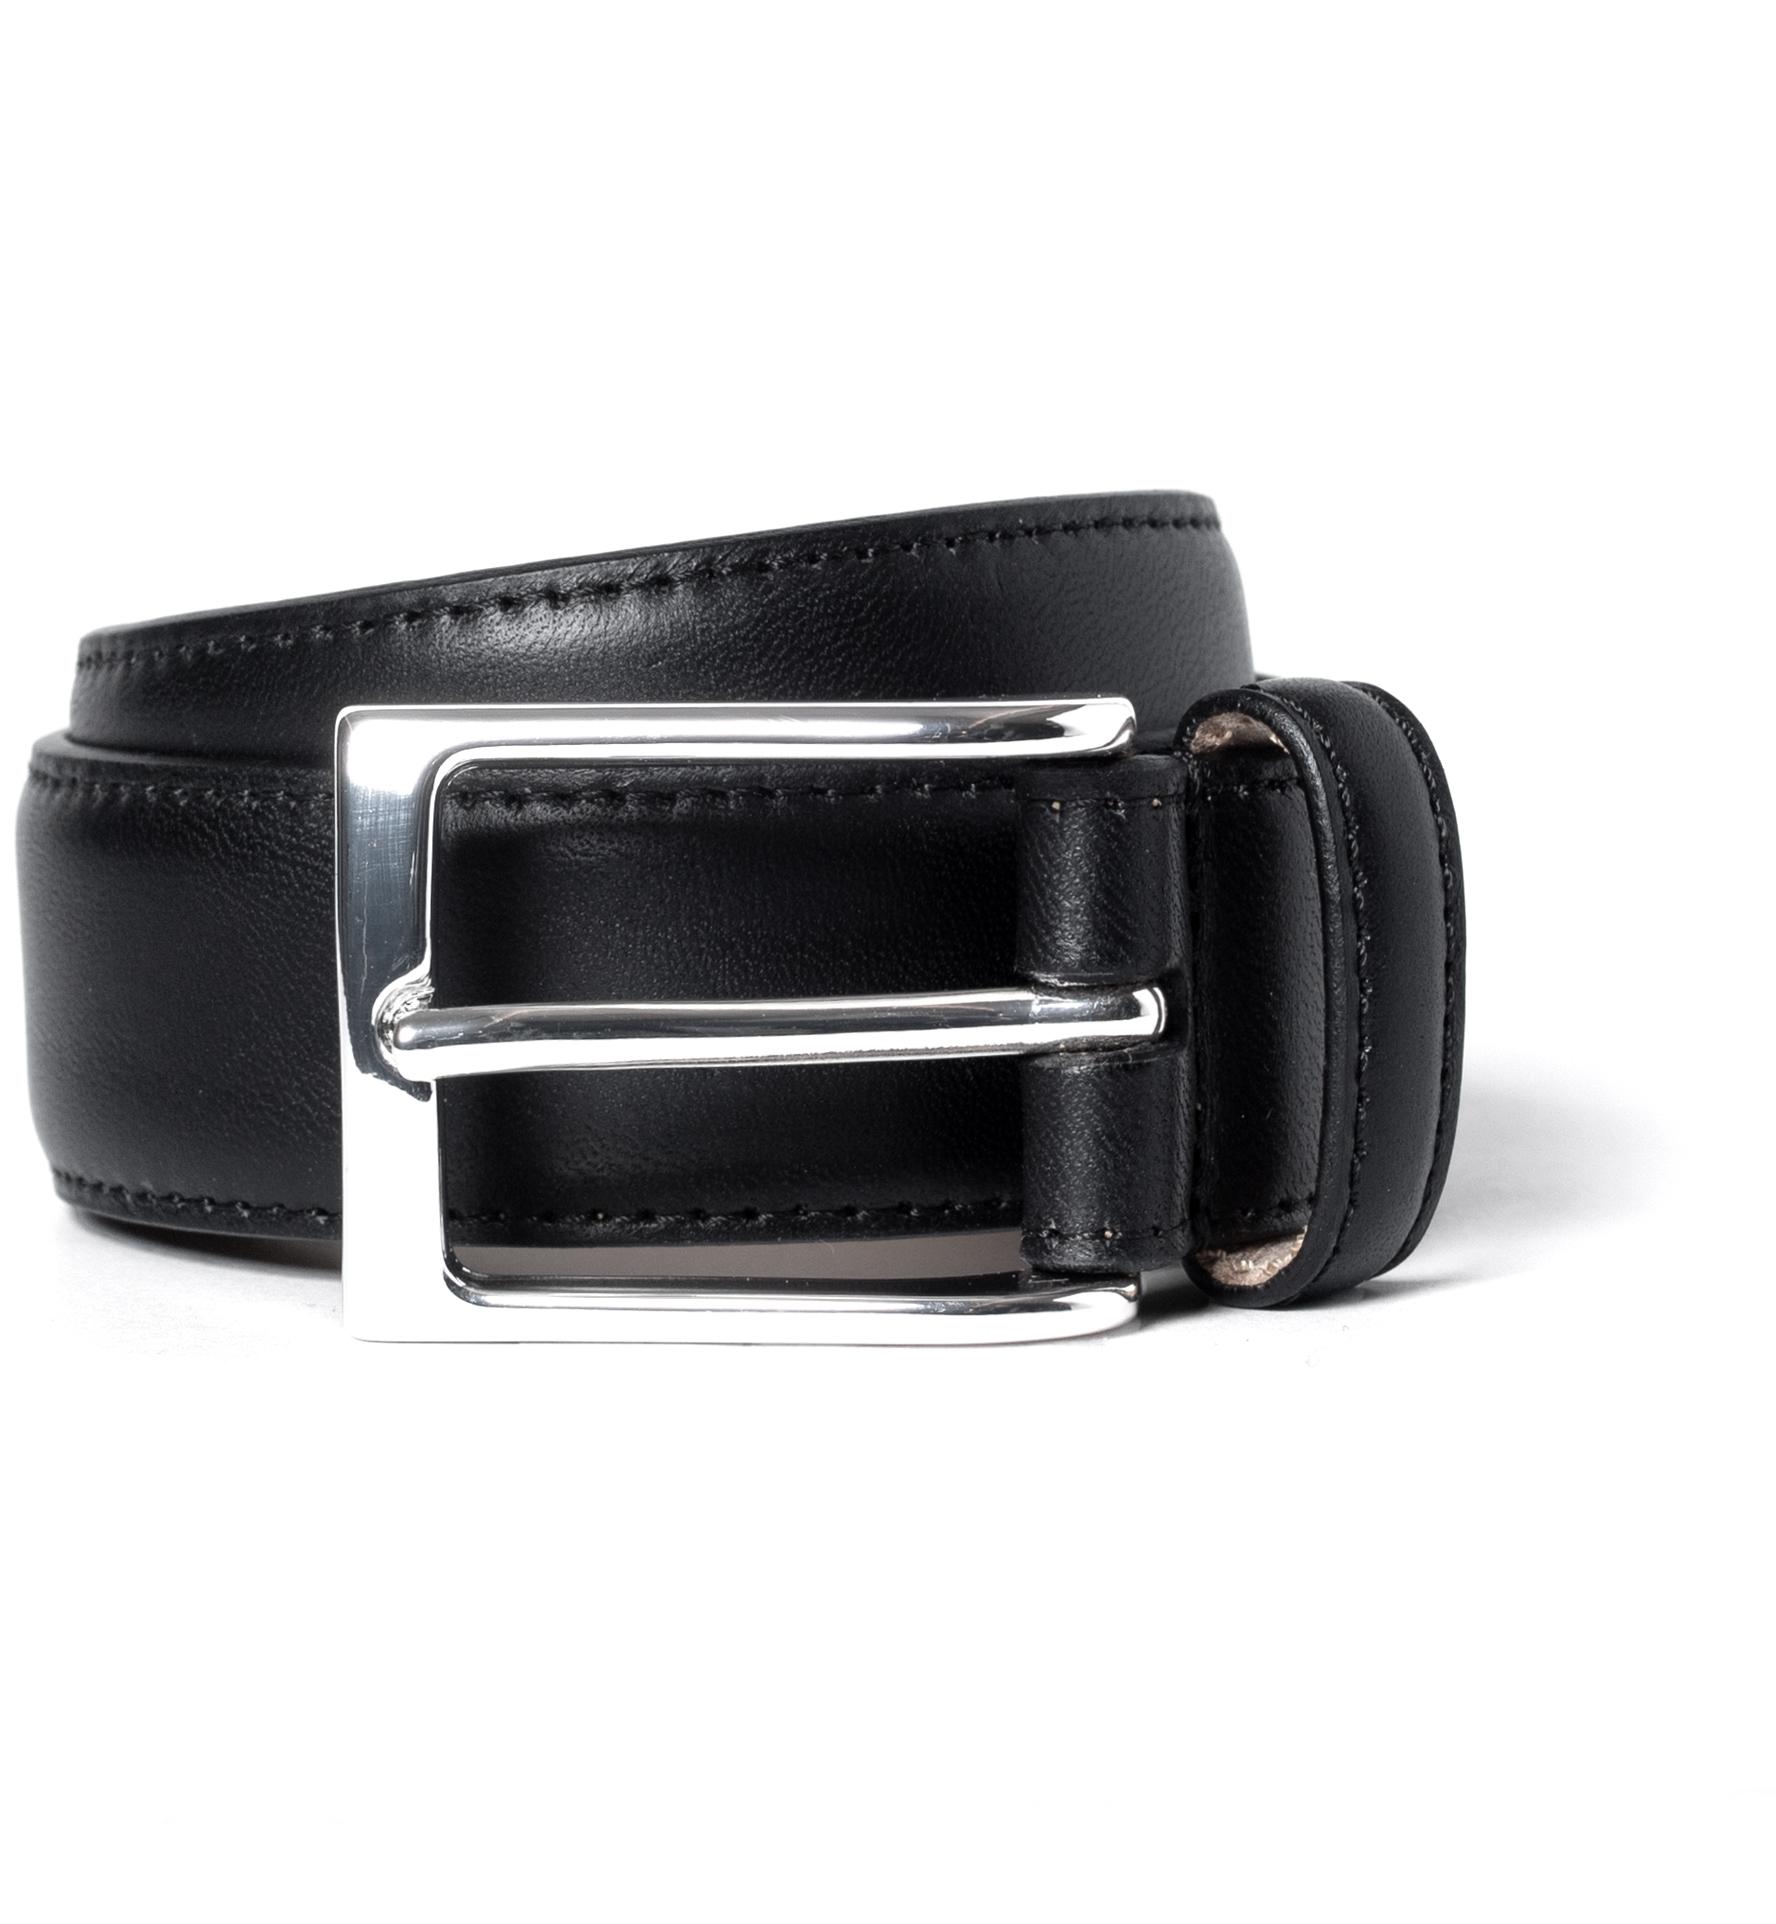 Zoom Image of Black Vachetta Leather Dress Belt